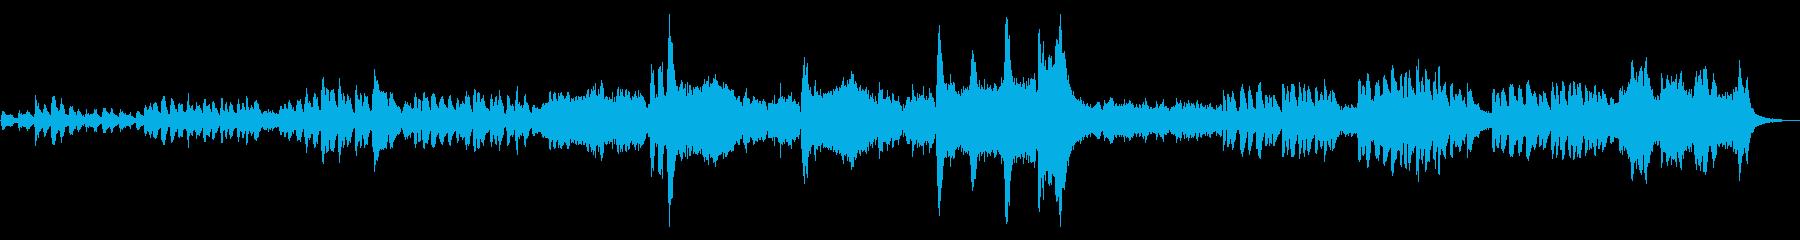 Classic Halloween comical nutcracker's reproduced waveform